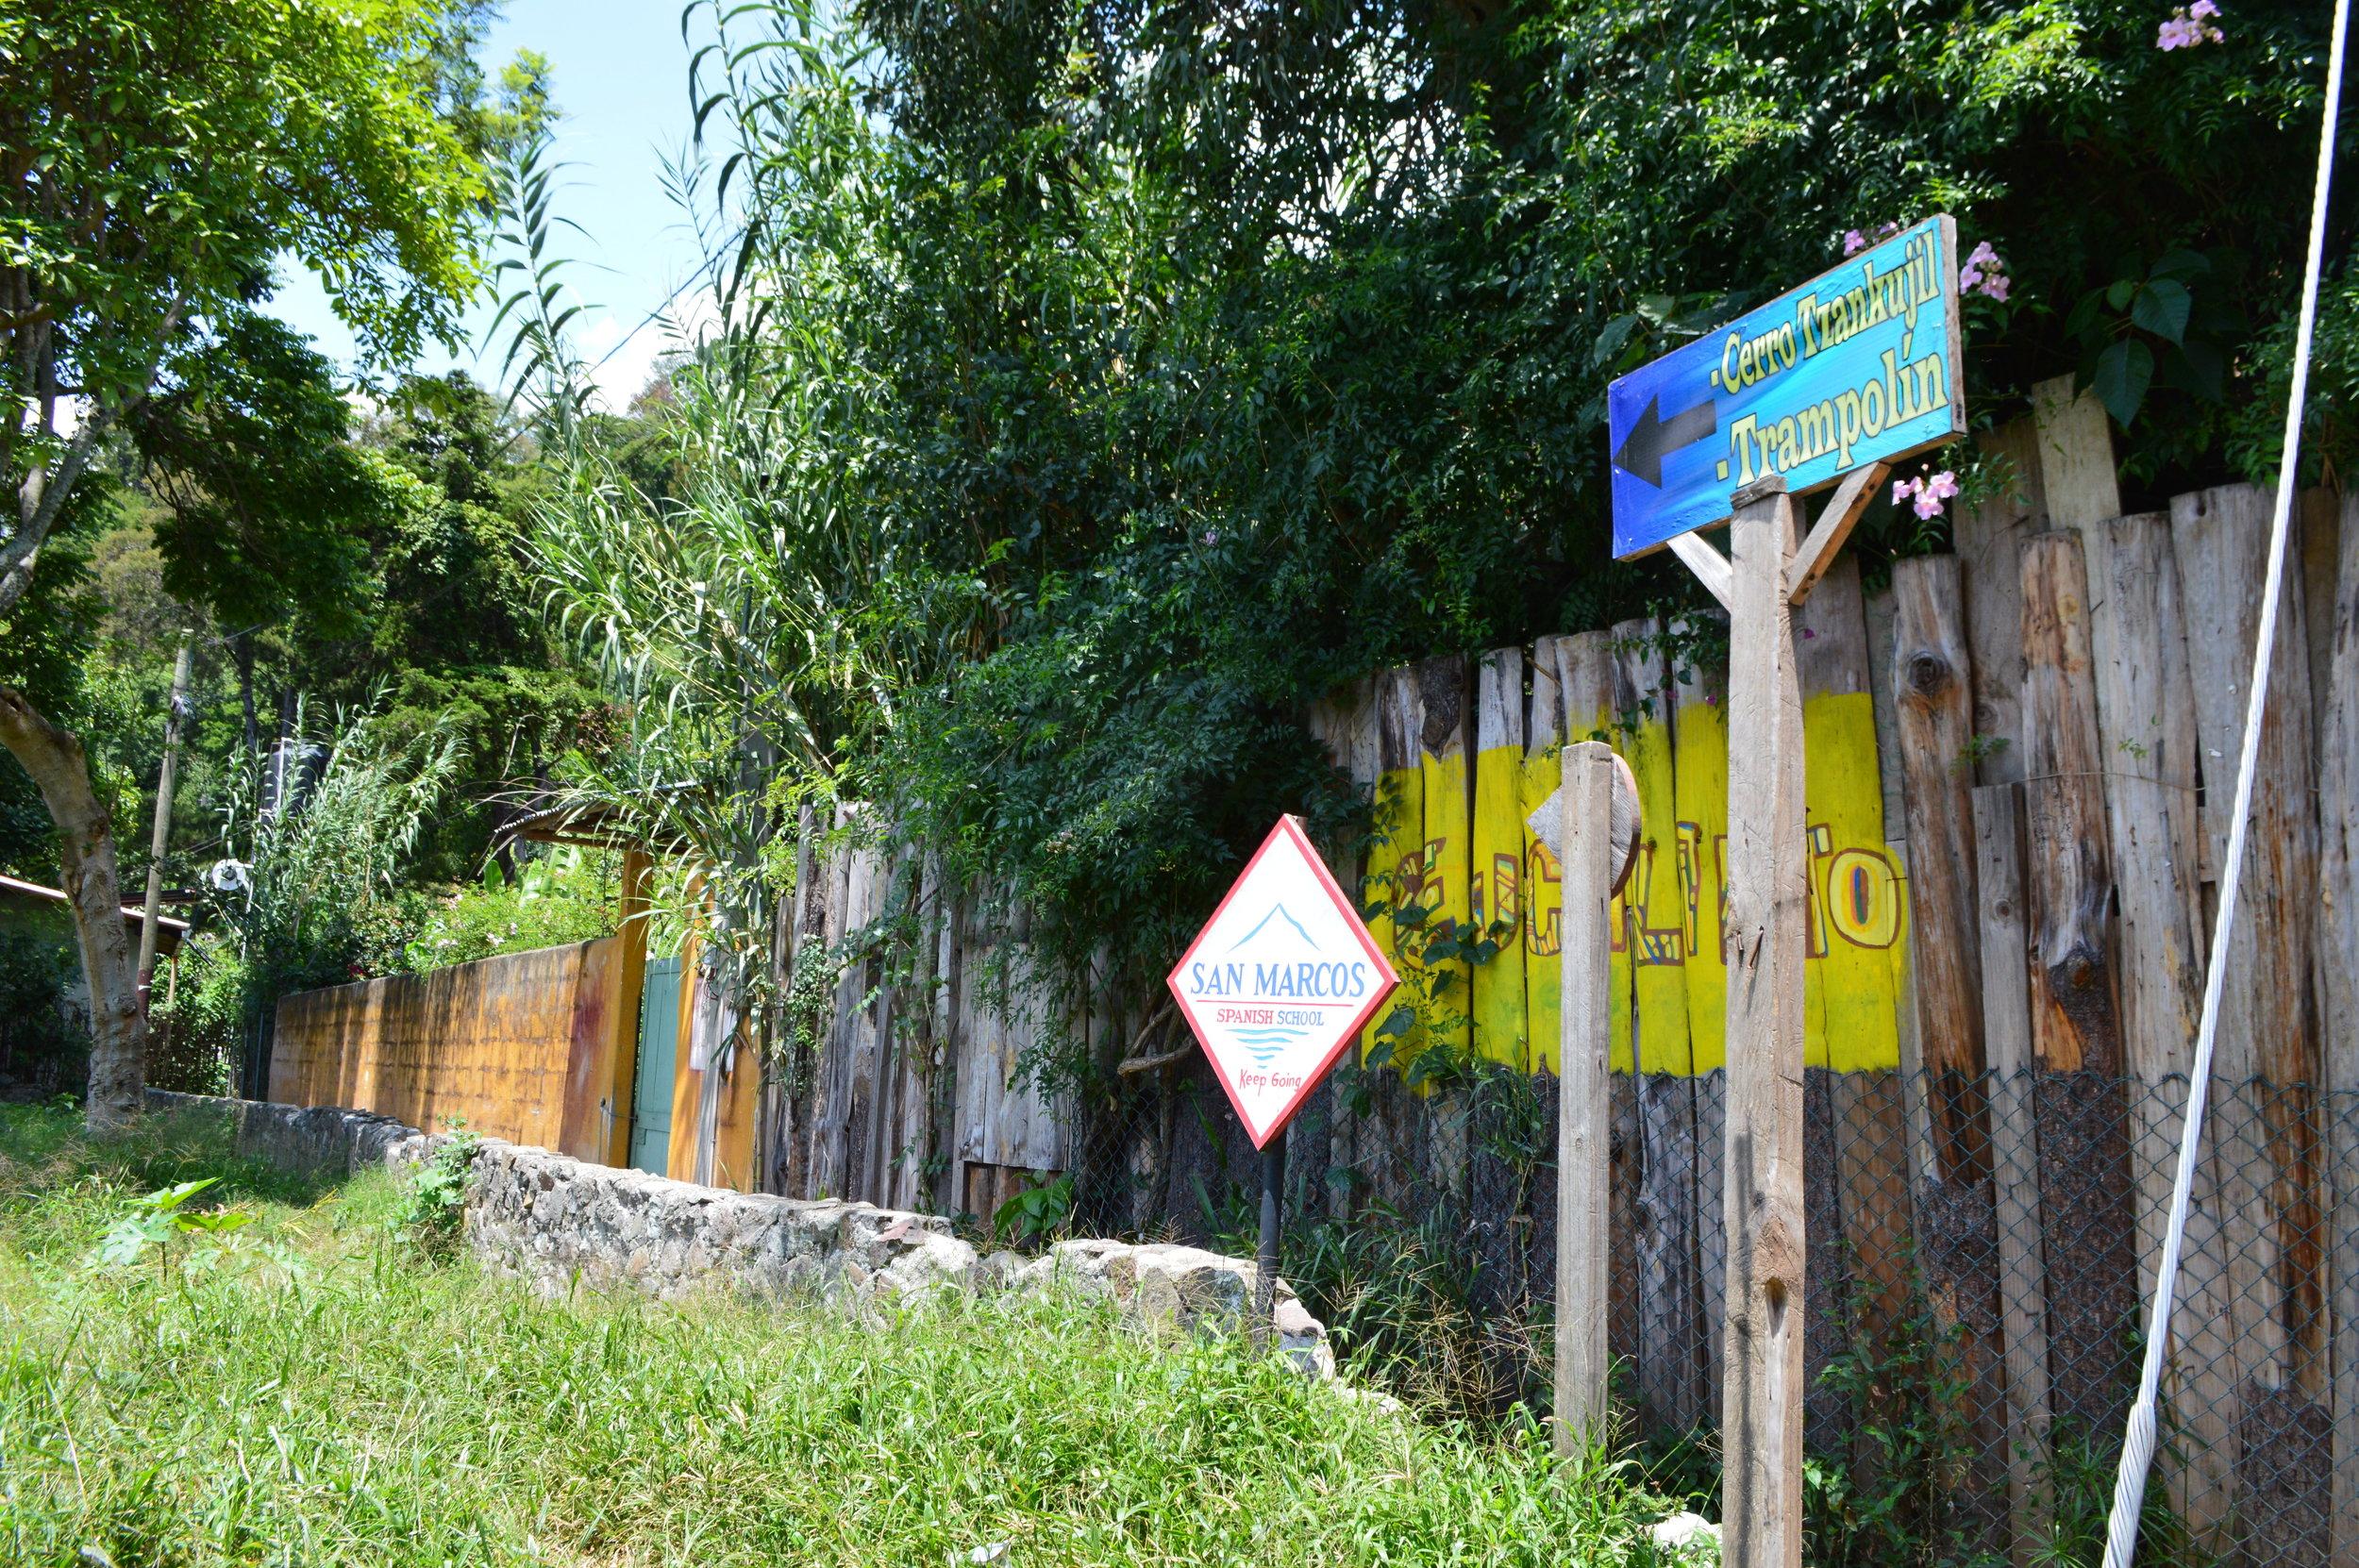 Small path along the stone wall to the entrance of Cerro Tzankujil